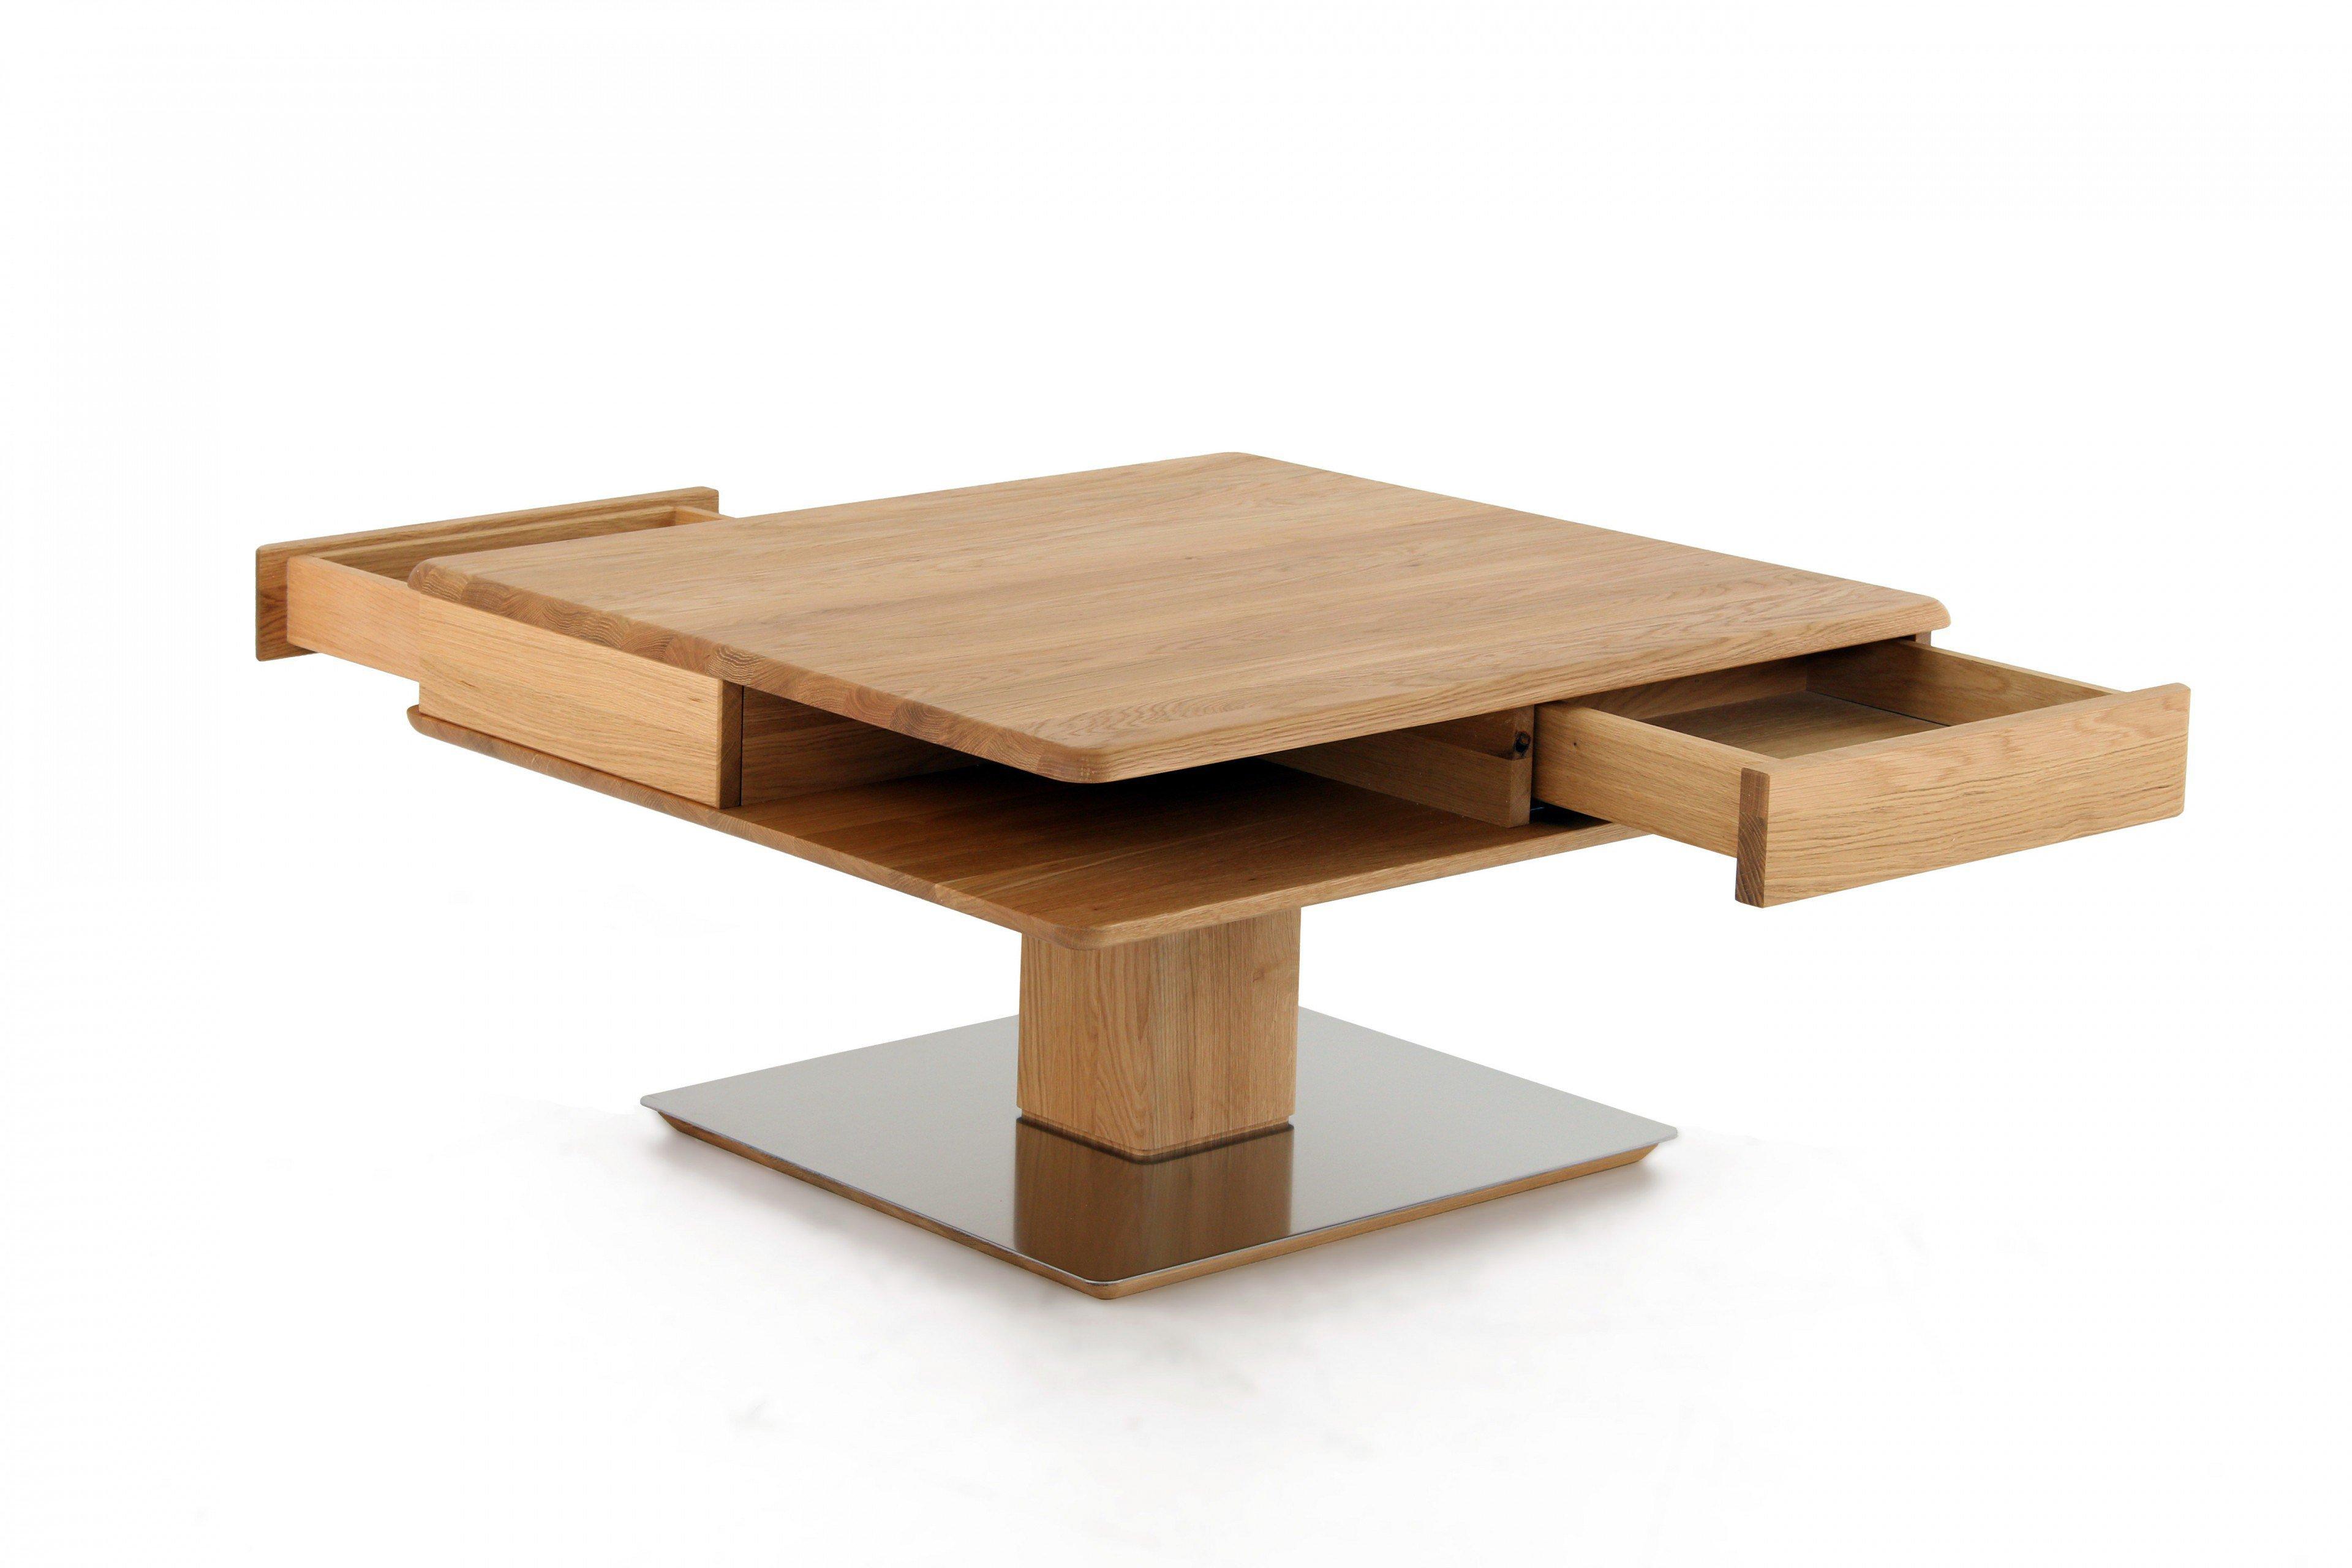 kollektion letz quincy couchtisch 52011000 m bel letz. Black Bedroom Furniture Sets. Home Design Ideas